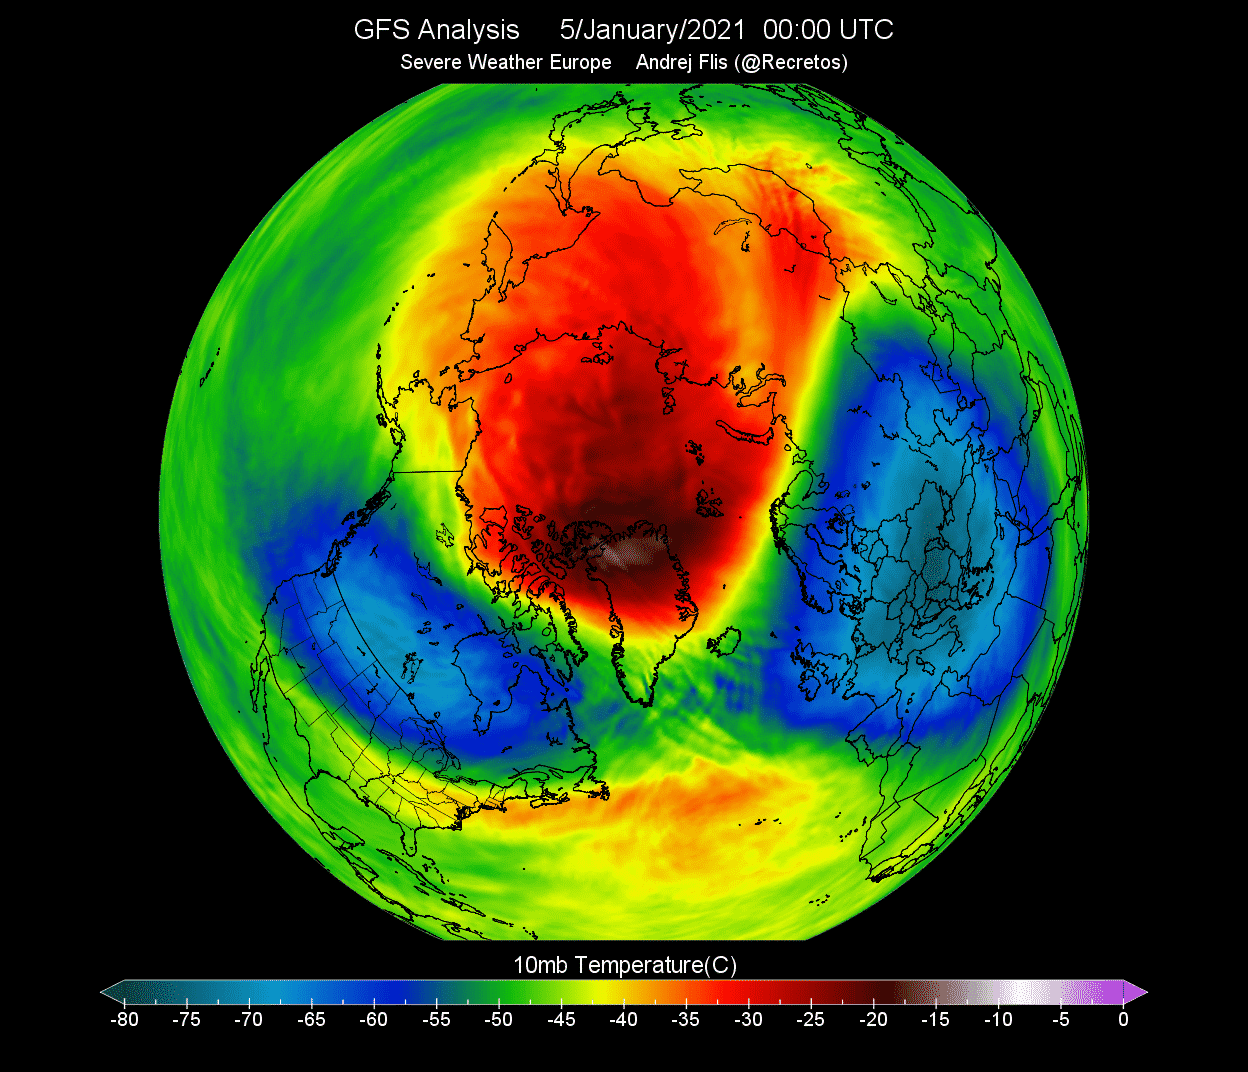 polar-vortex-weather-winter-united-states-europe-major-stratospheric-warming-temperature-event